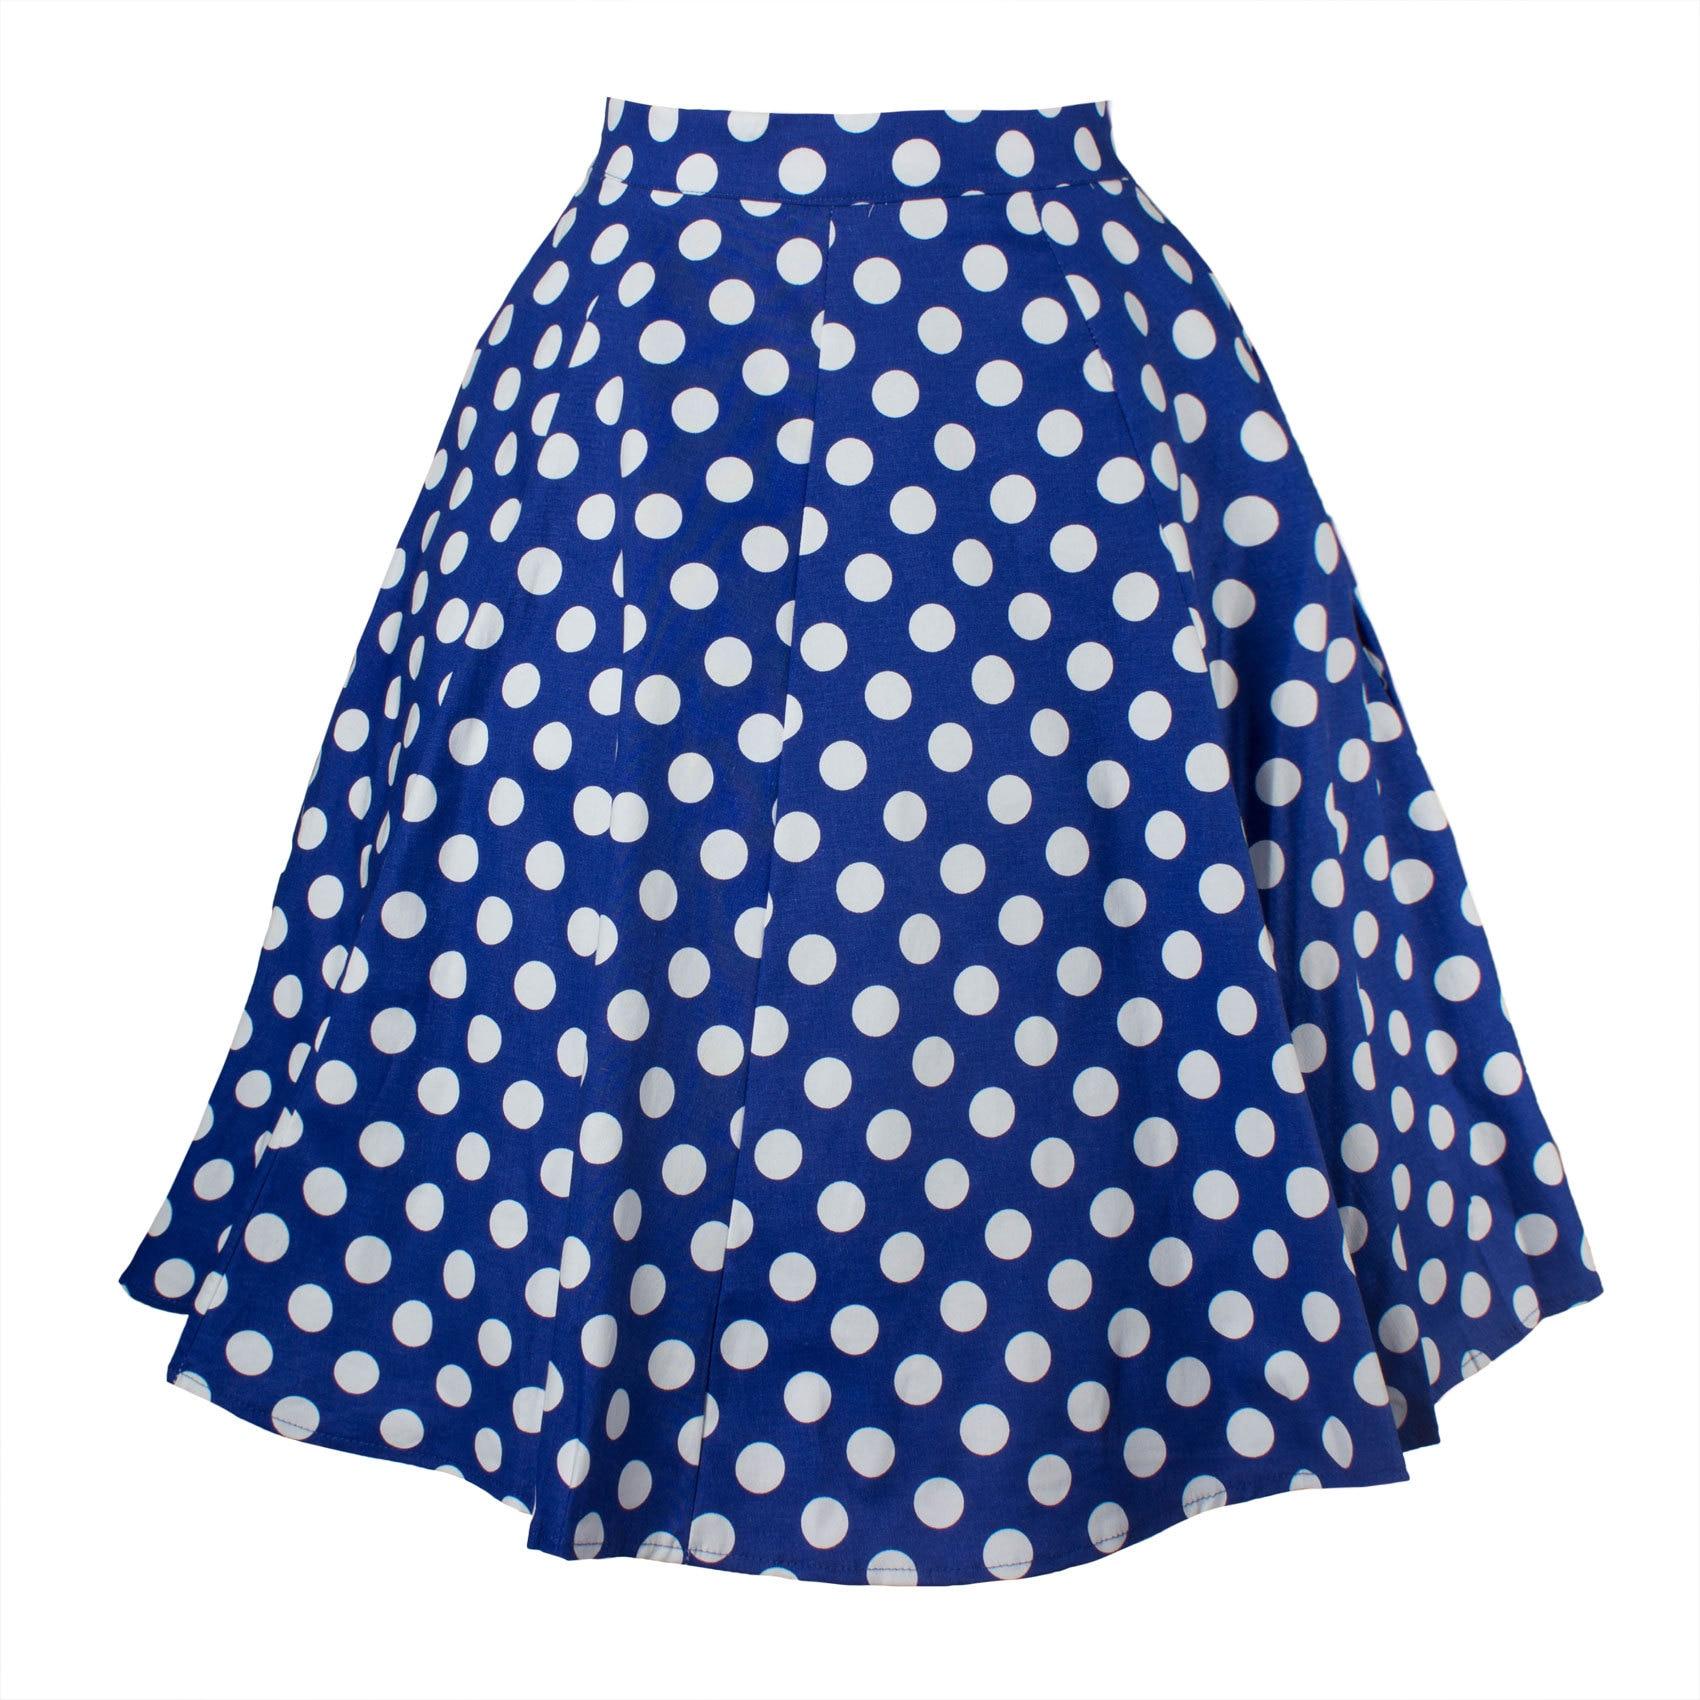 Daily Suit OWLPRINCESS  Women's 2020 Autumn Retro Polka Dot Skirt